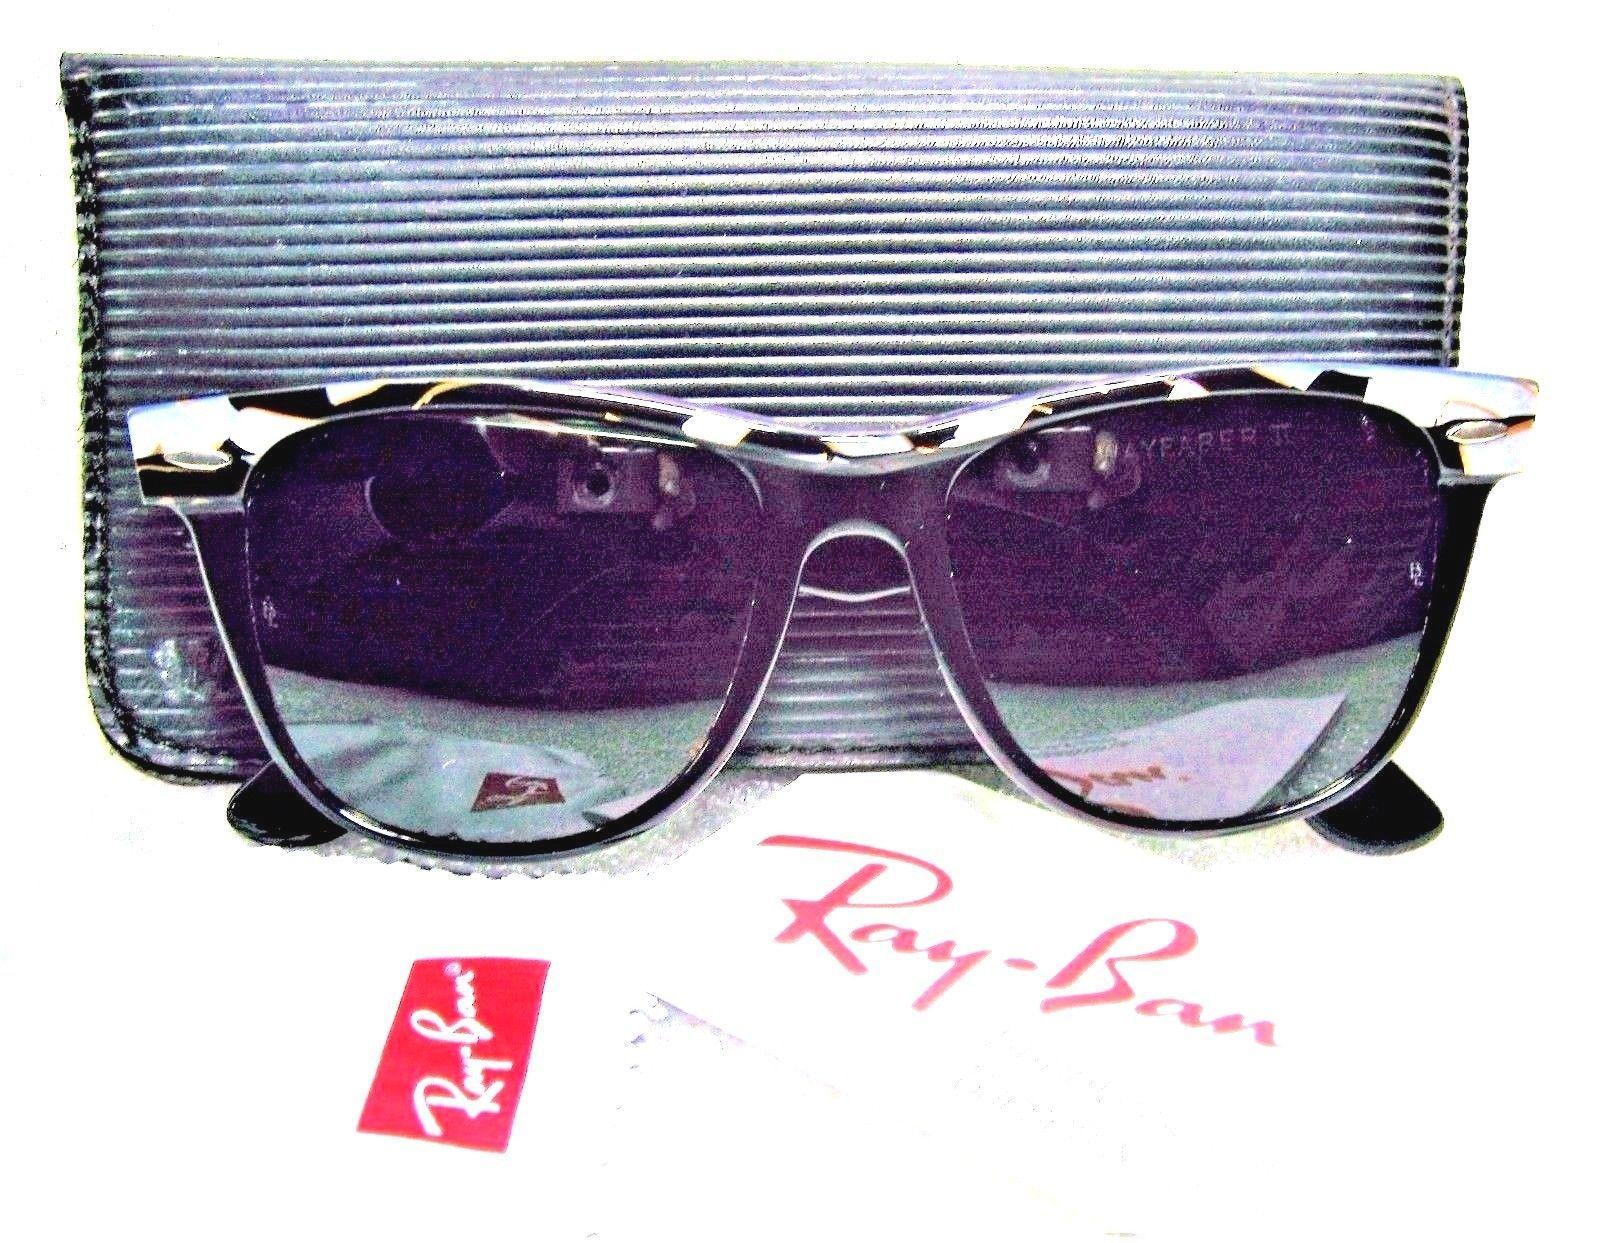 0103e30fb2 S l1600. S l1600. Previous. Ray-Ban USA NOS Vintage B L Wayfarer II W1089  Street Neat Mosaic New Sunglasses